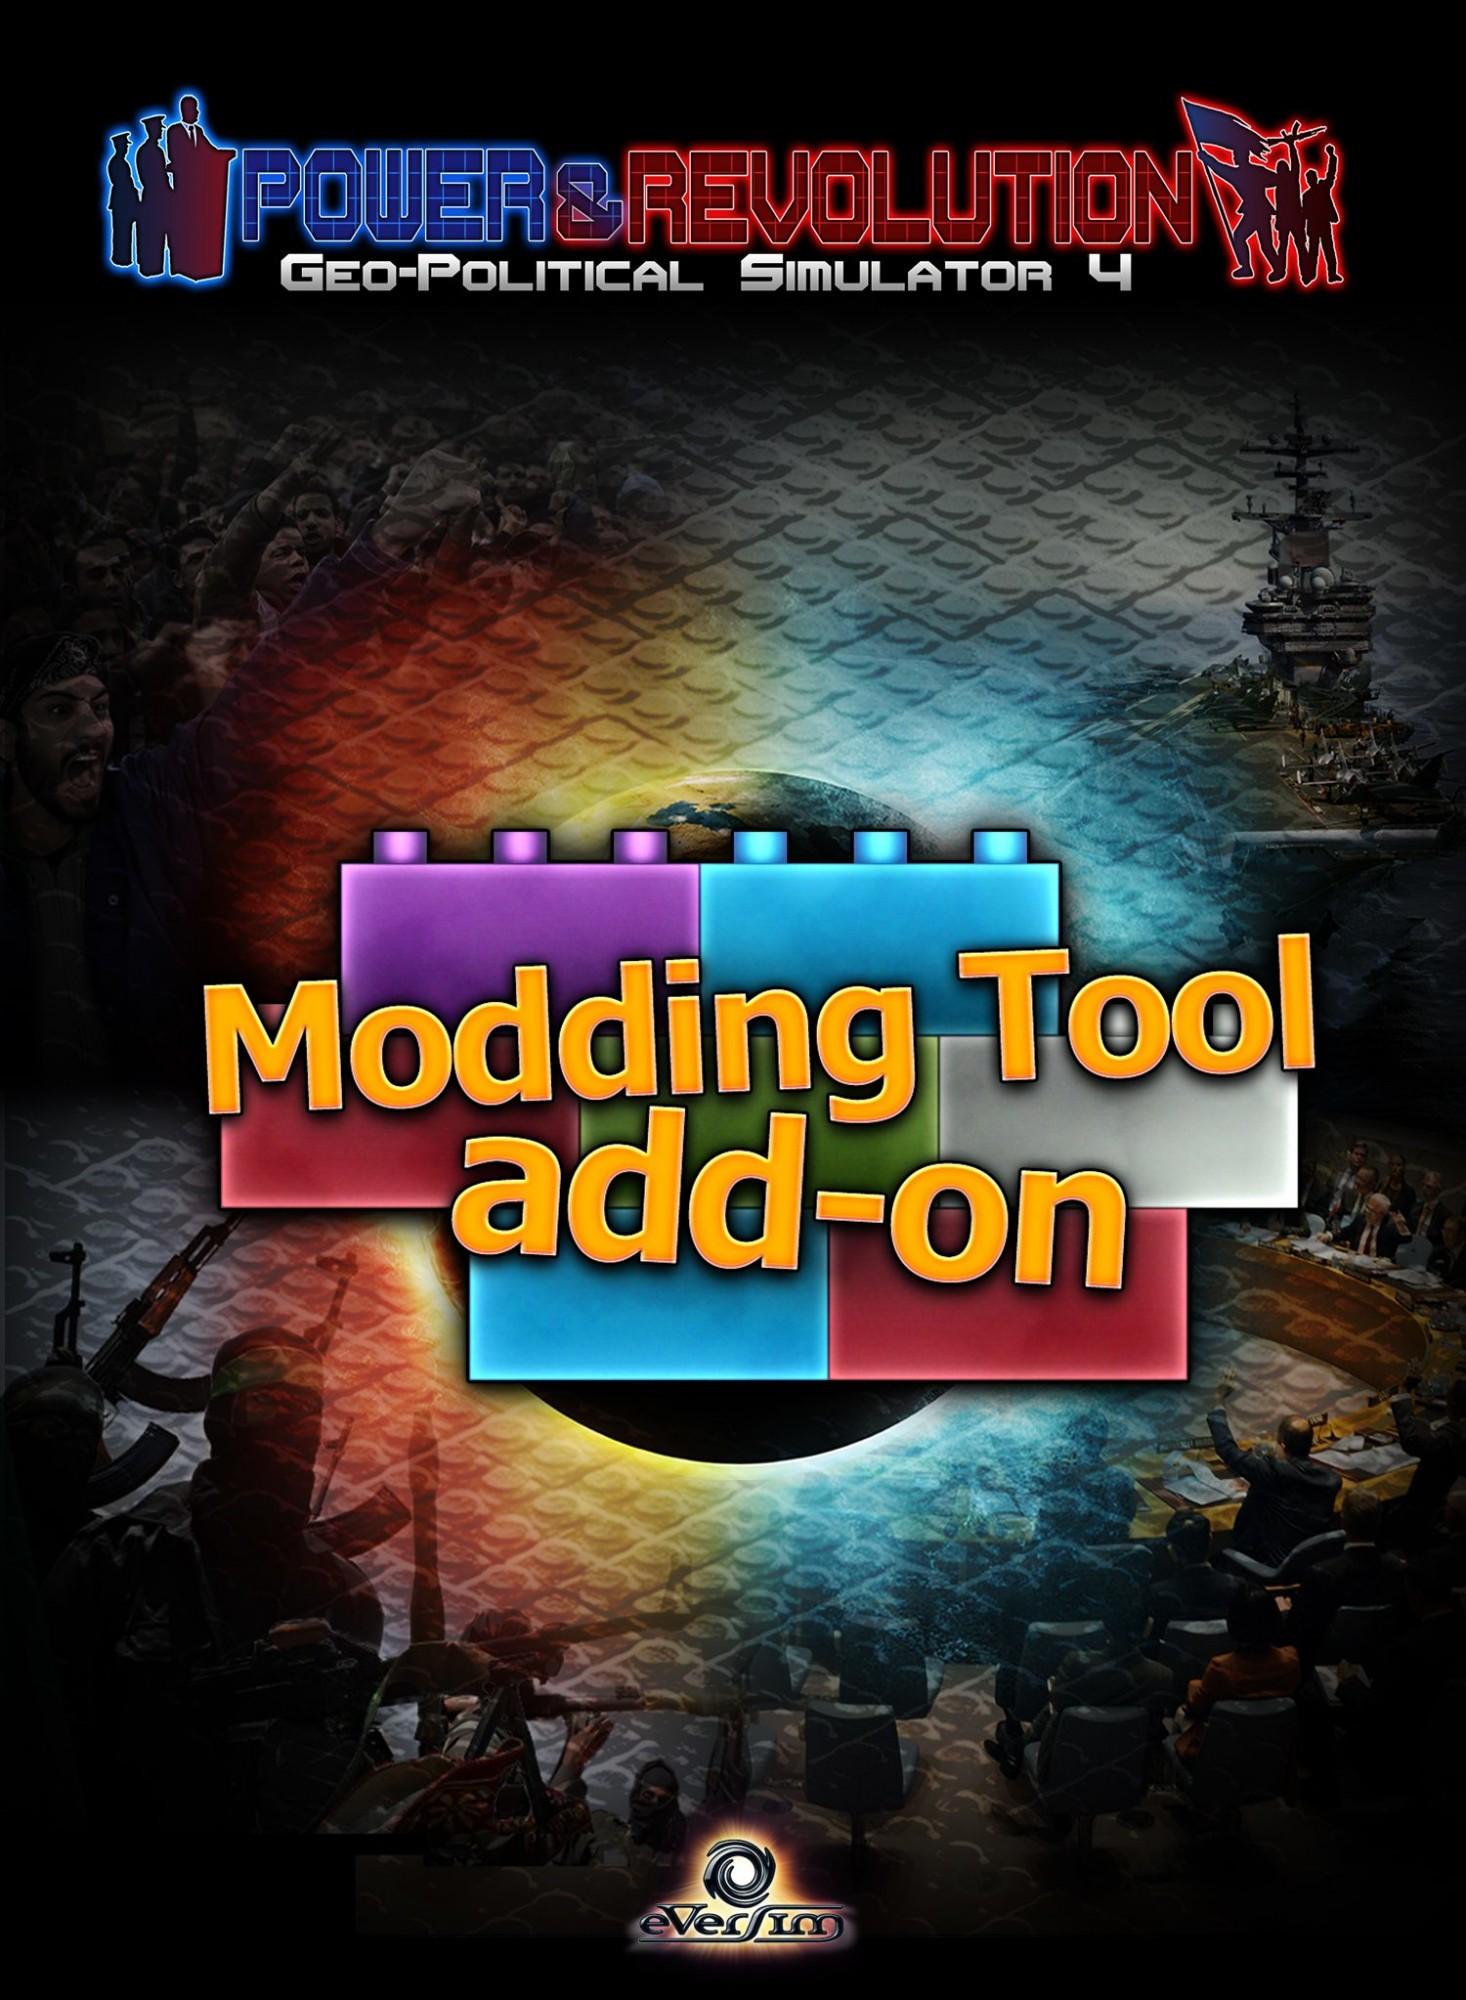 Nexway Power & Revolution: Geo-Political Simulator 4 Modding tooll add-on, Mac Video game downloadable content (DLC) Español